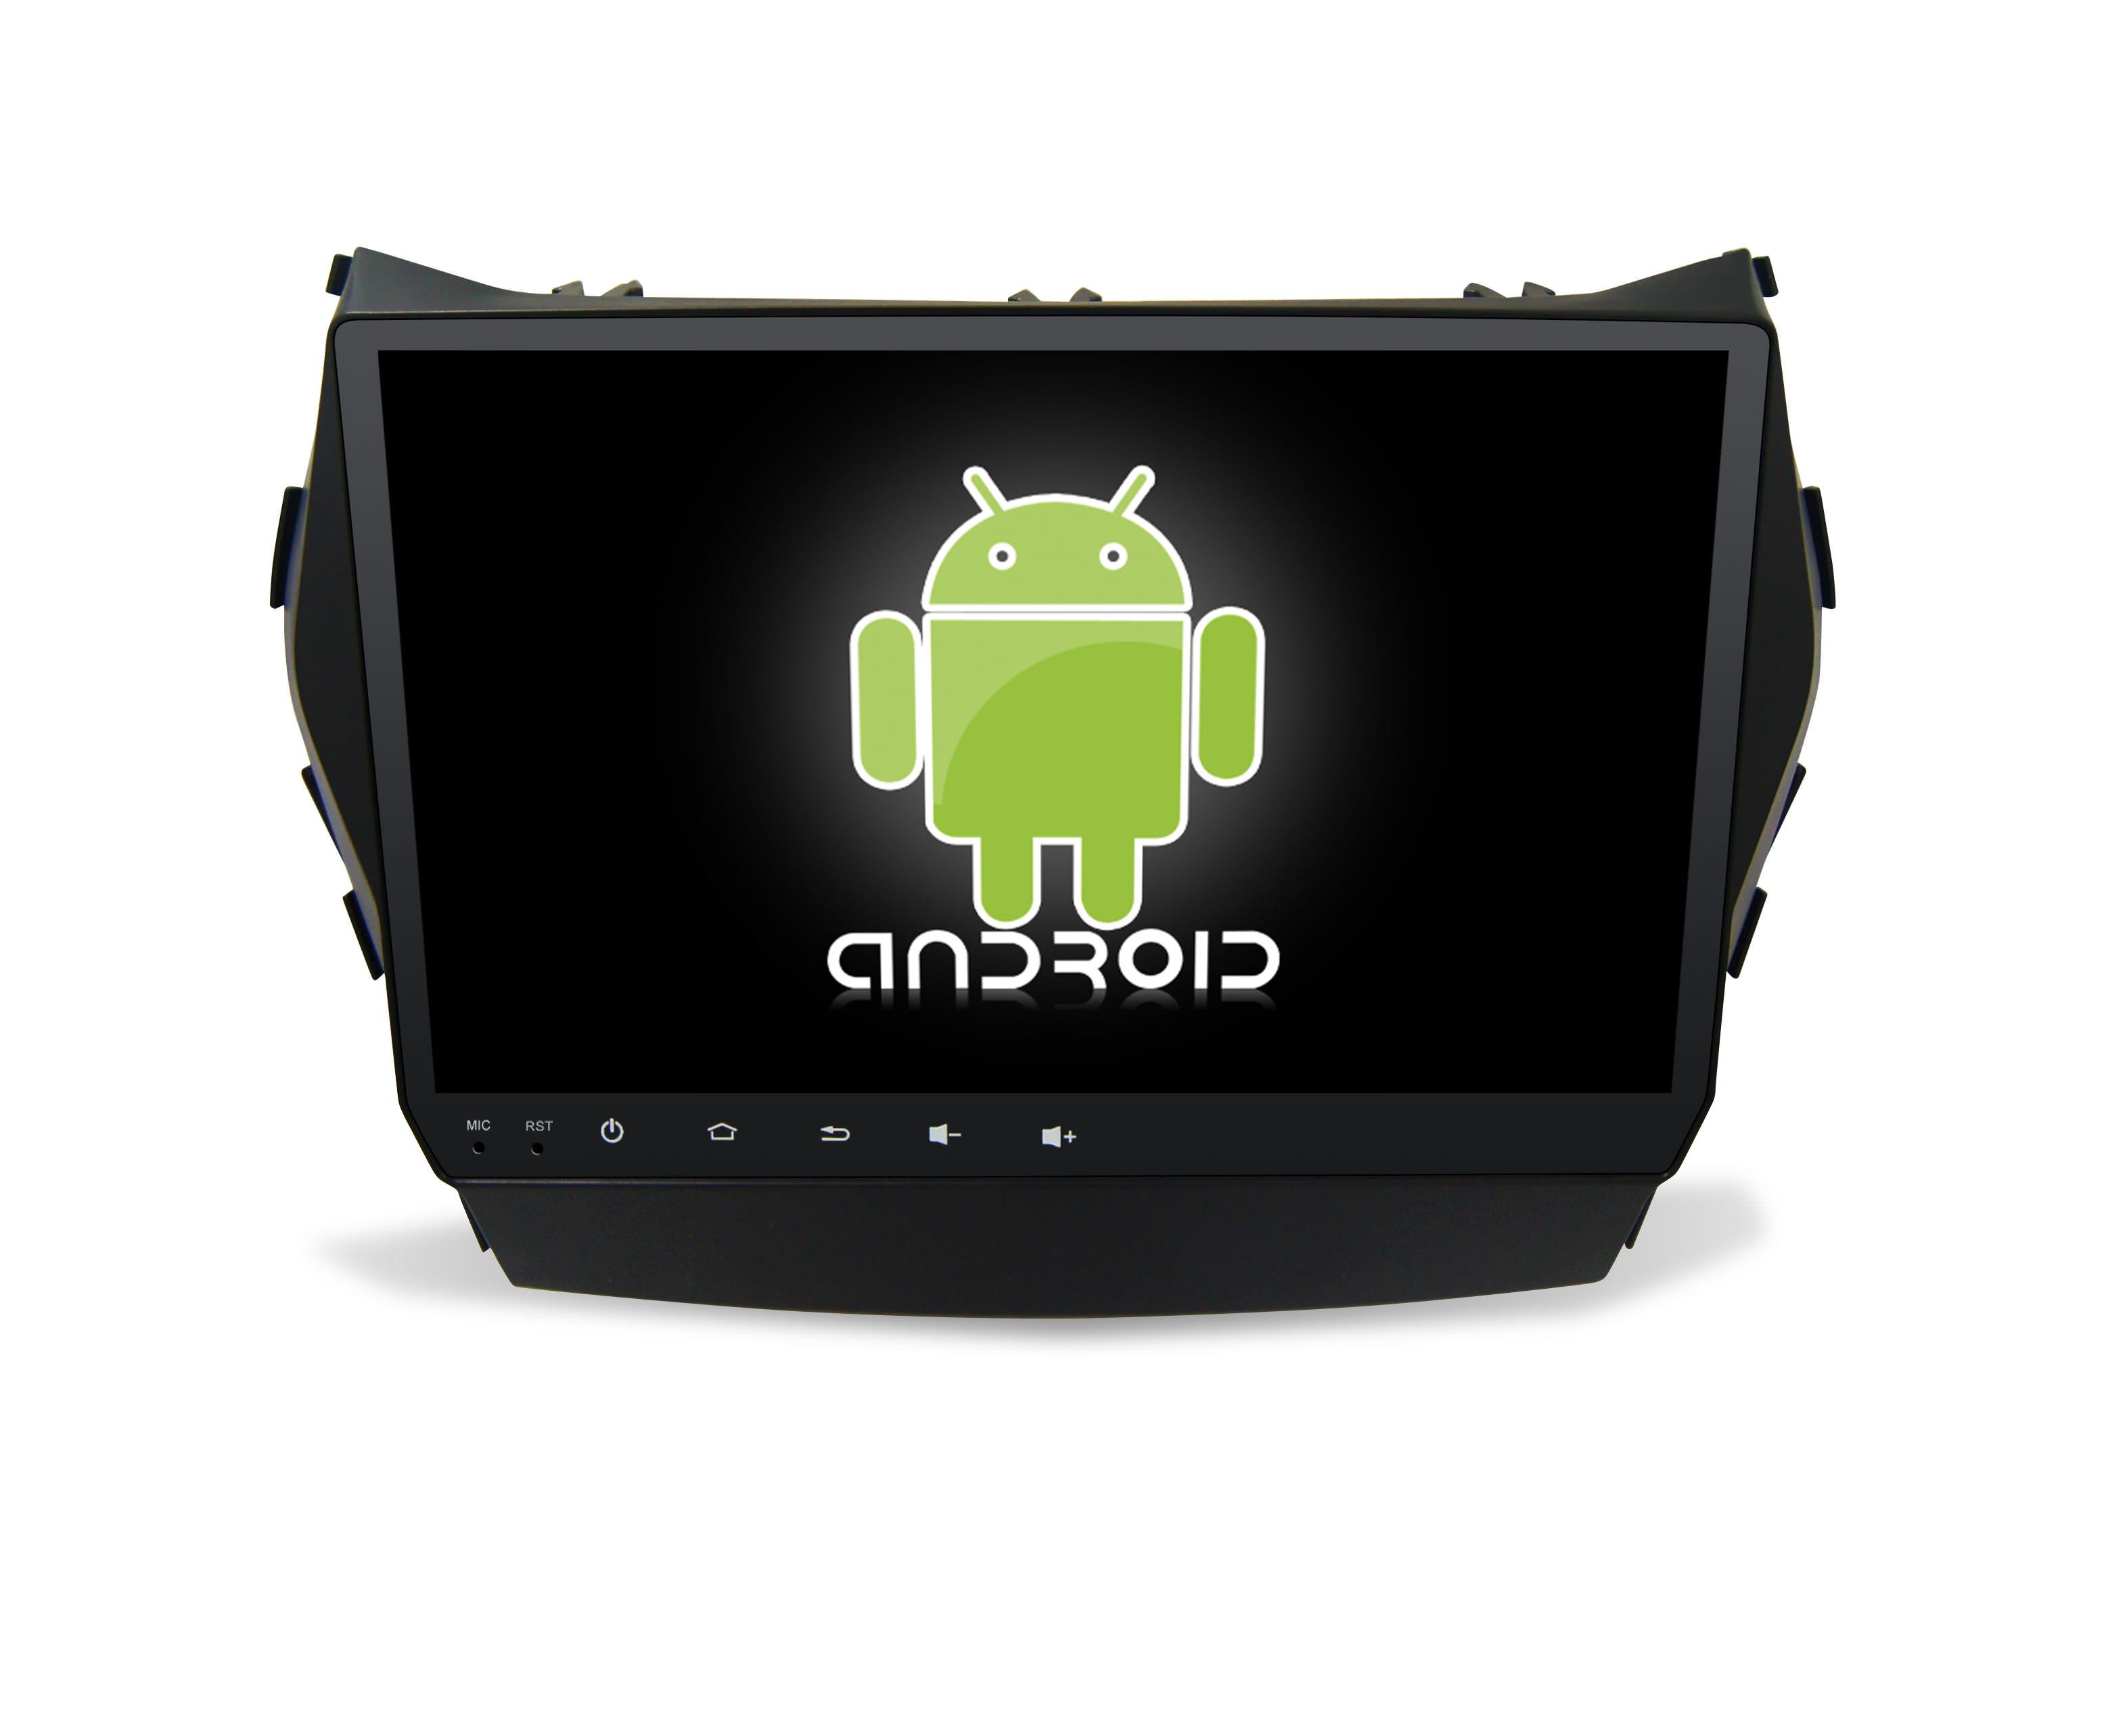 Штатная магнитола CARMEDIA KR-9054-T8 Hyundai Santa Fe 2012+ (DM), Grand Santa Fe 2014+ bluboo d1 3g smartphone 5 0 дюймовый android 7 0 mtk6580a quad core 1 3ghz 2gb ram 16gb rom сканер отпечатков пальцев двойные задние камеры